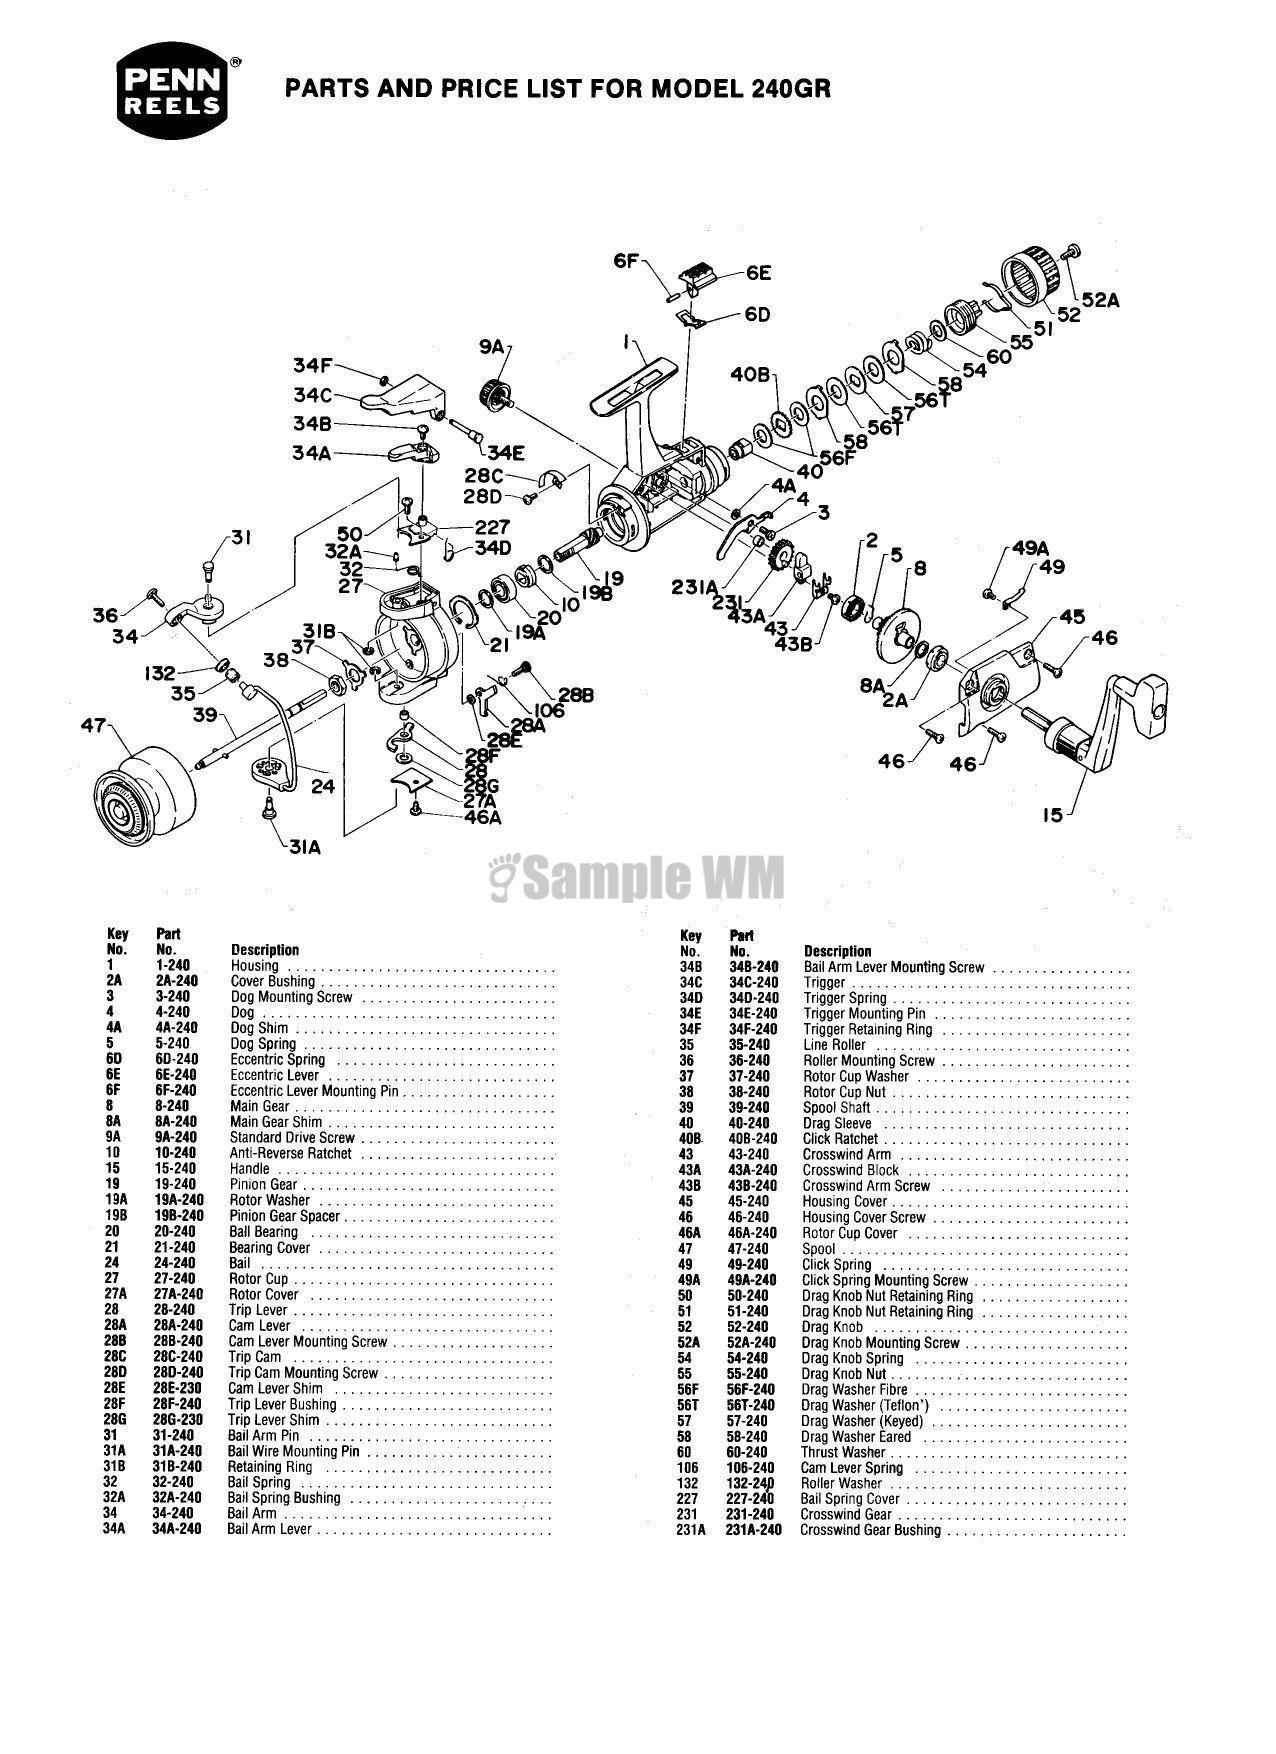 Marvelous fishing reel parts diagram pictures best image engine penn 240gr mikes reel repair pooptronica Images